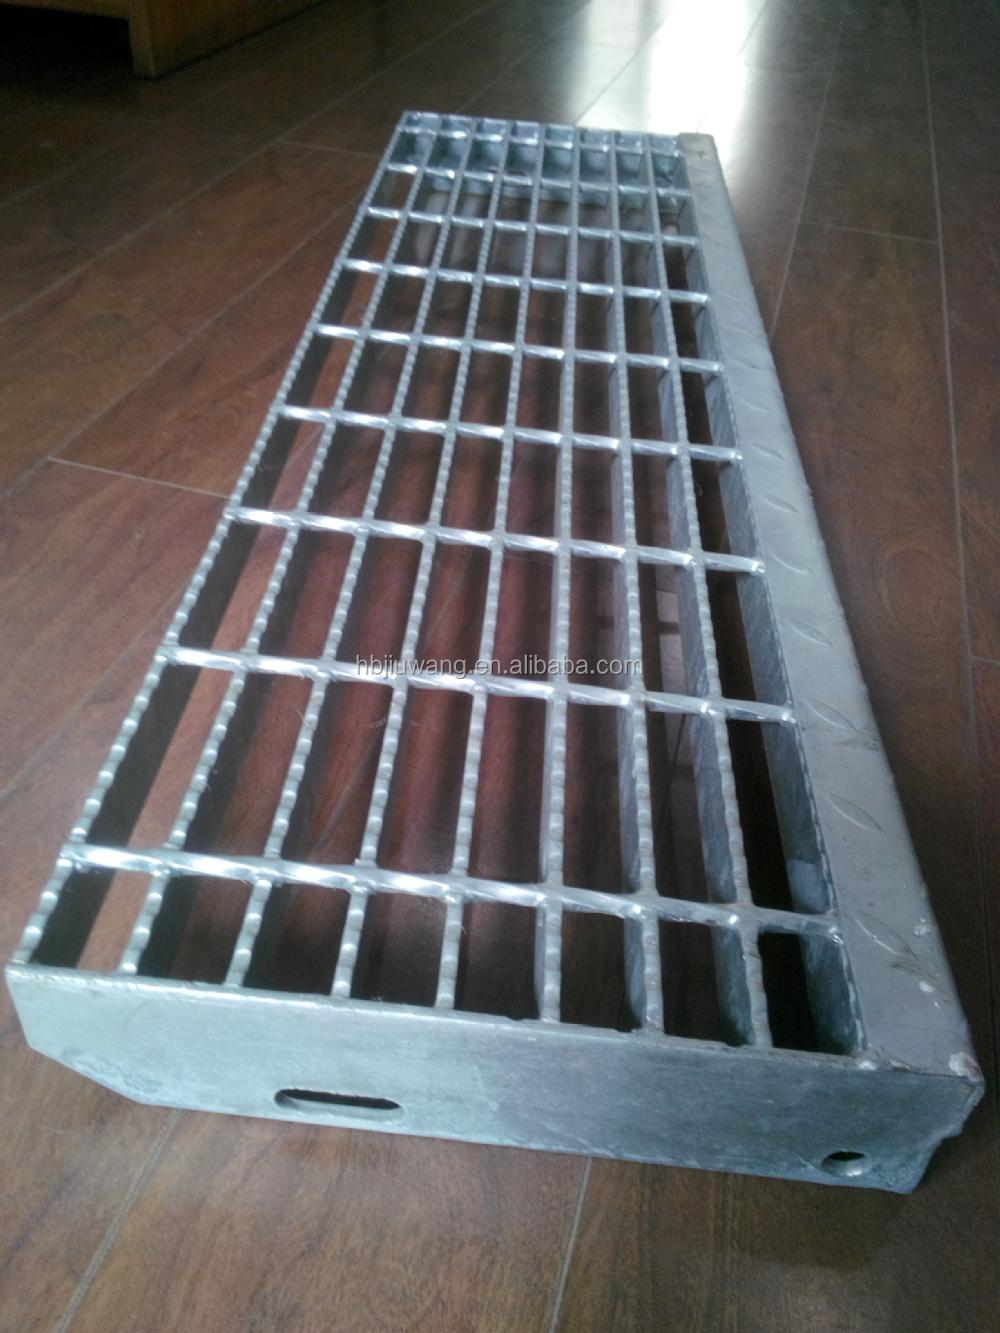 Strip Nosing Steel Stair Treads Factory Direct Buy Strip